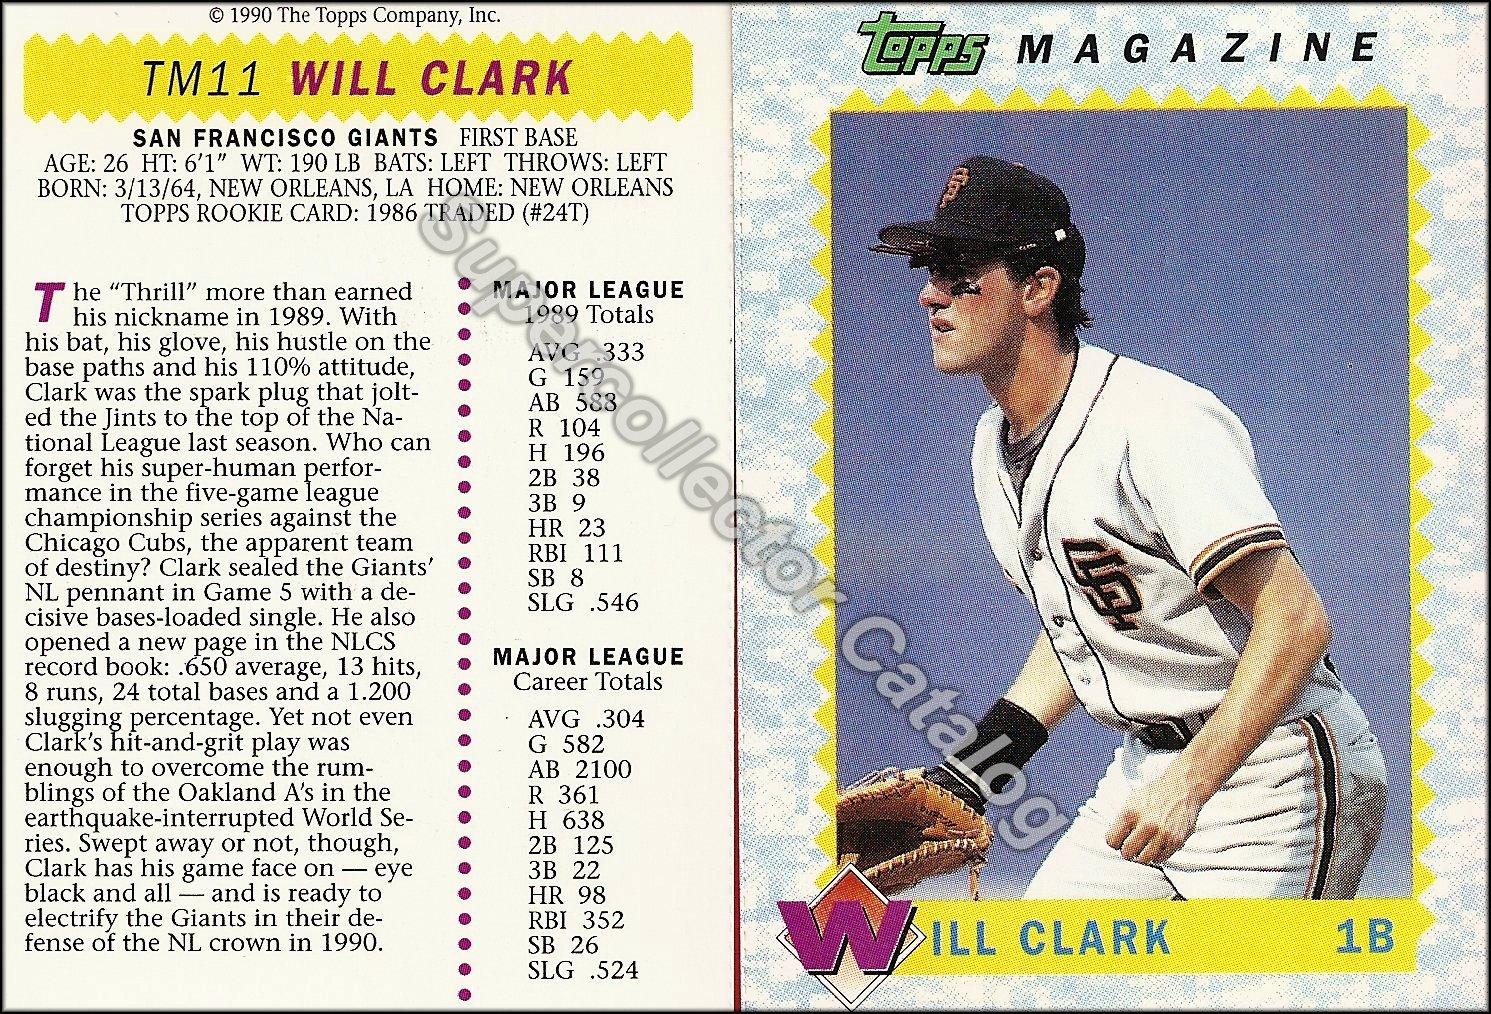 1990 Topps Magazine Insert